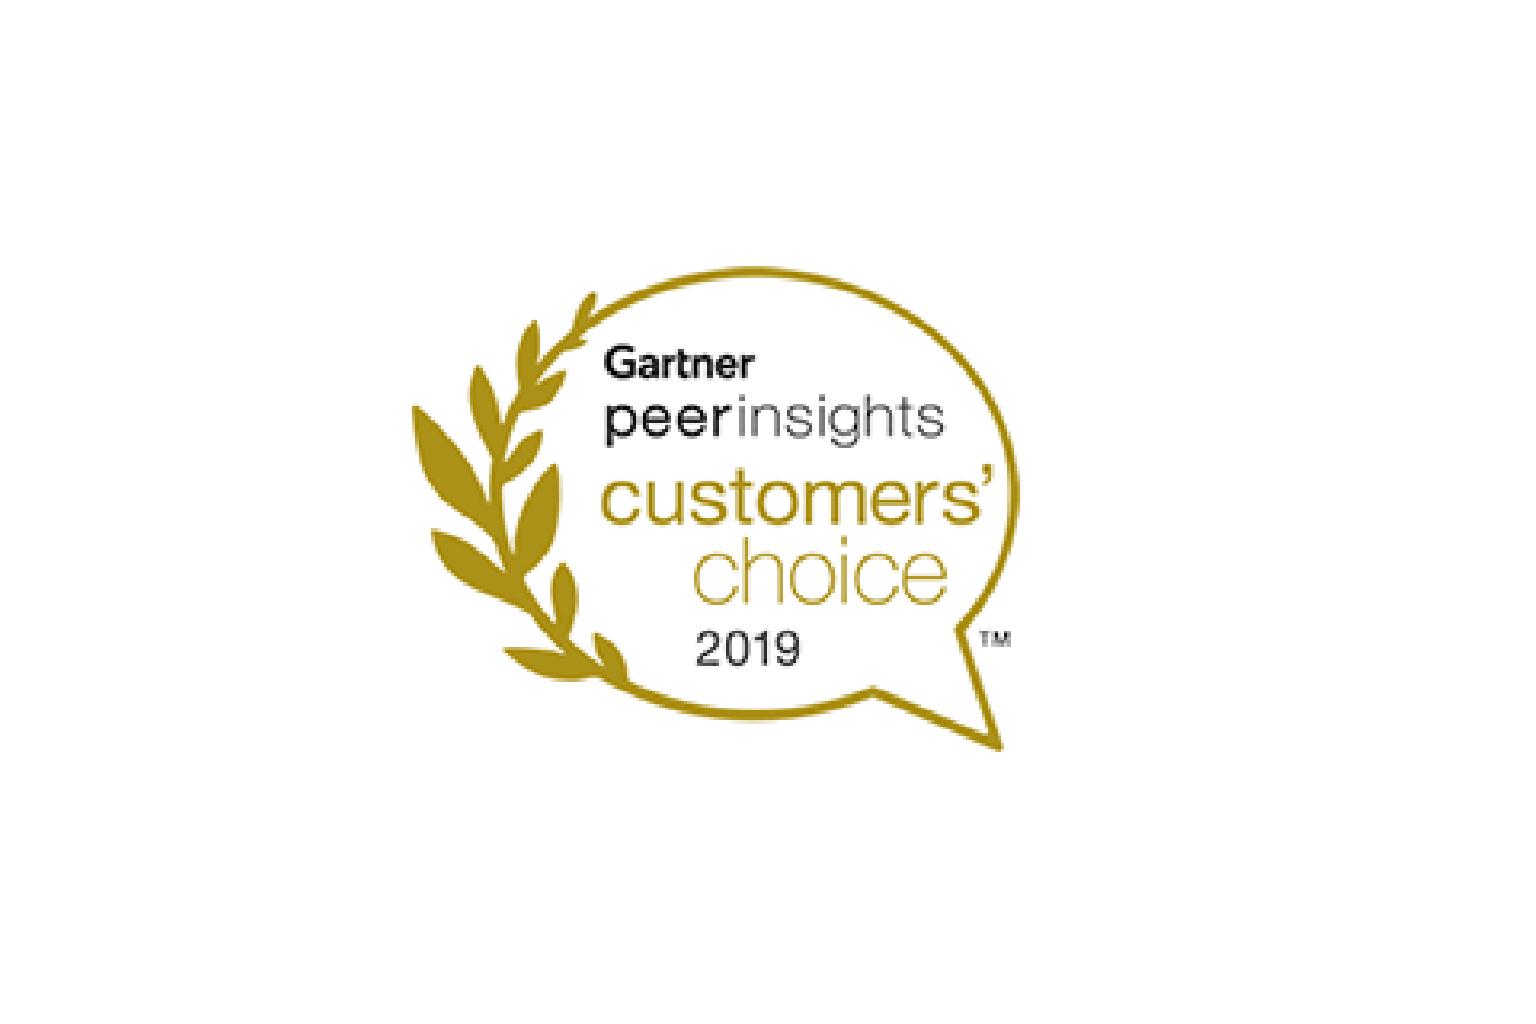 Gartner peer insights customers choice 2019